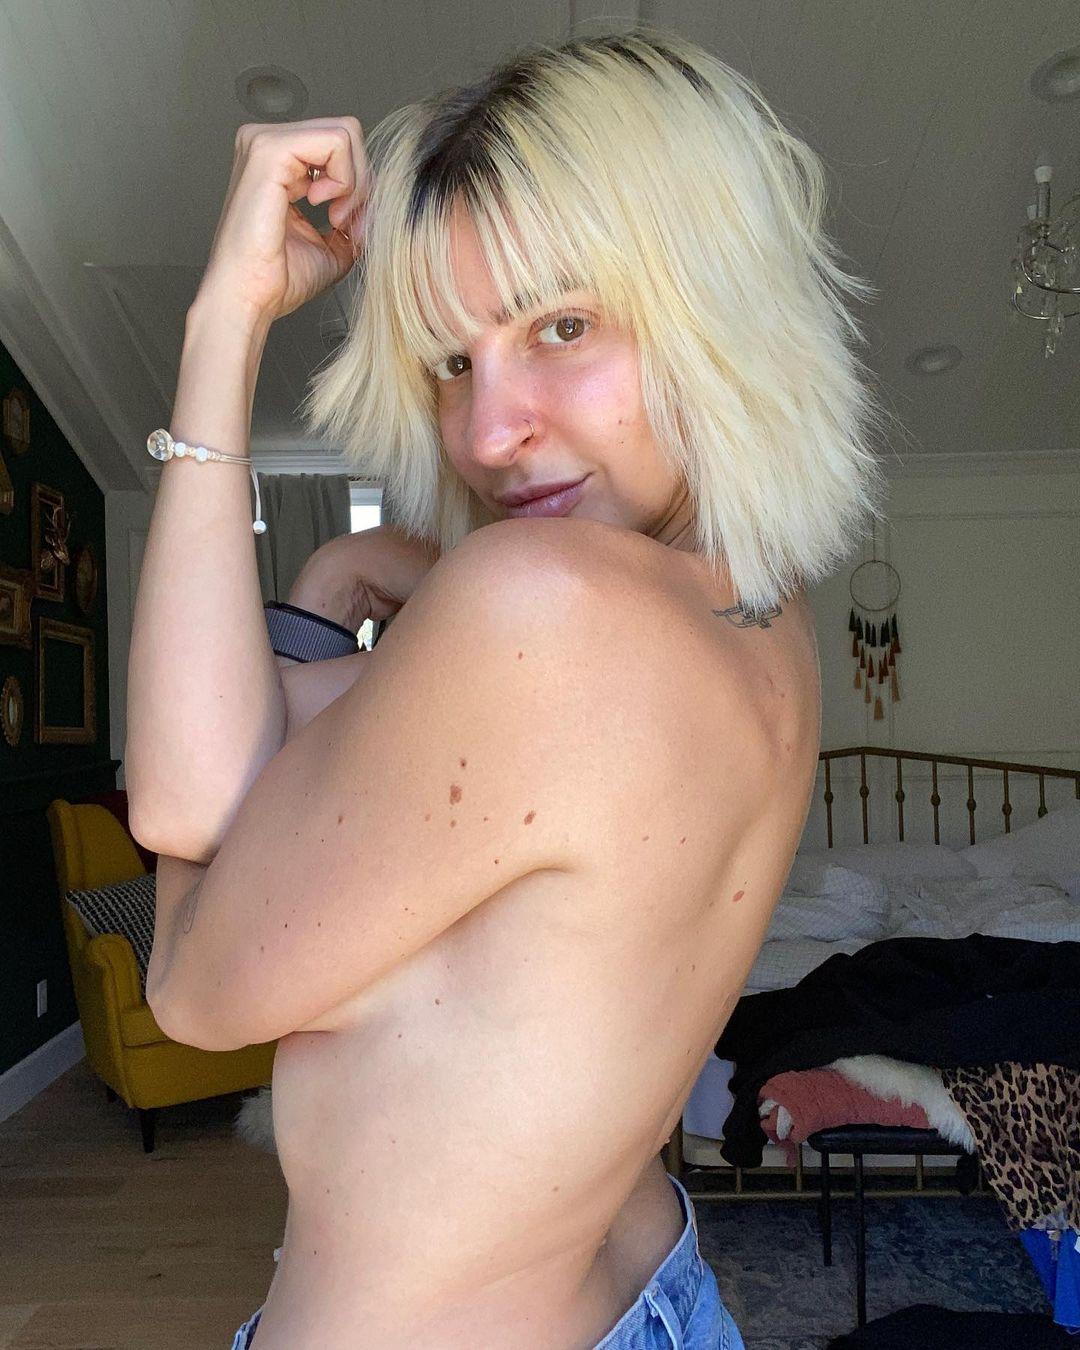 Gabbie Hanna Topless Handbra Leaked 0013